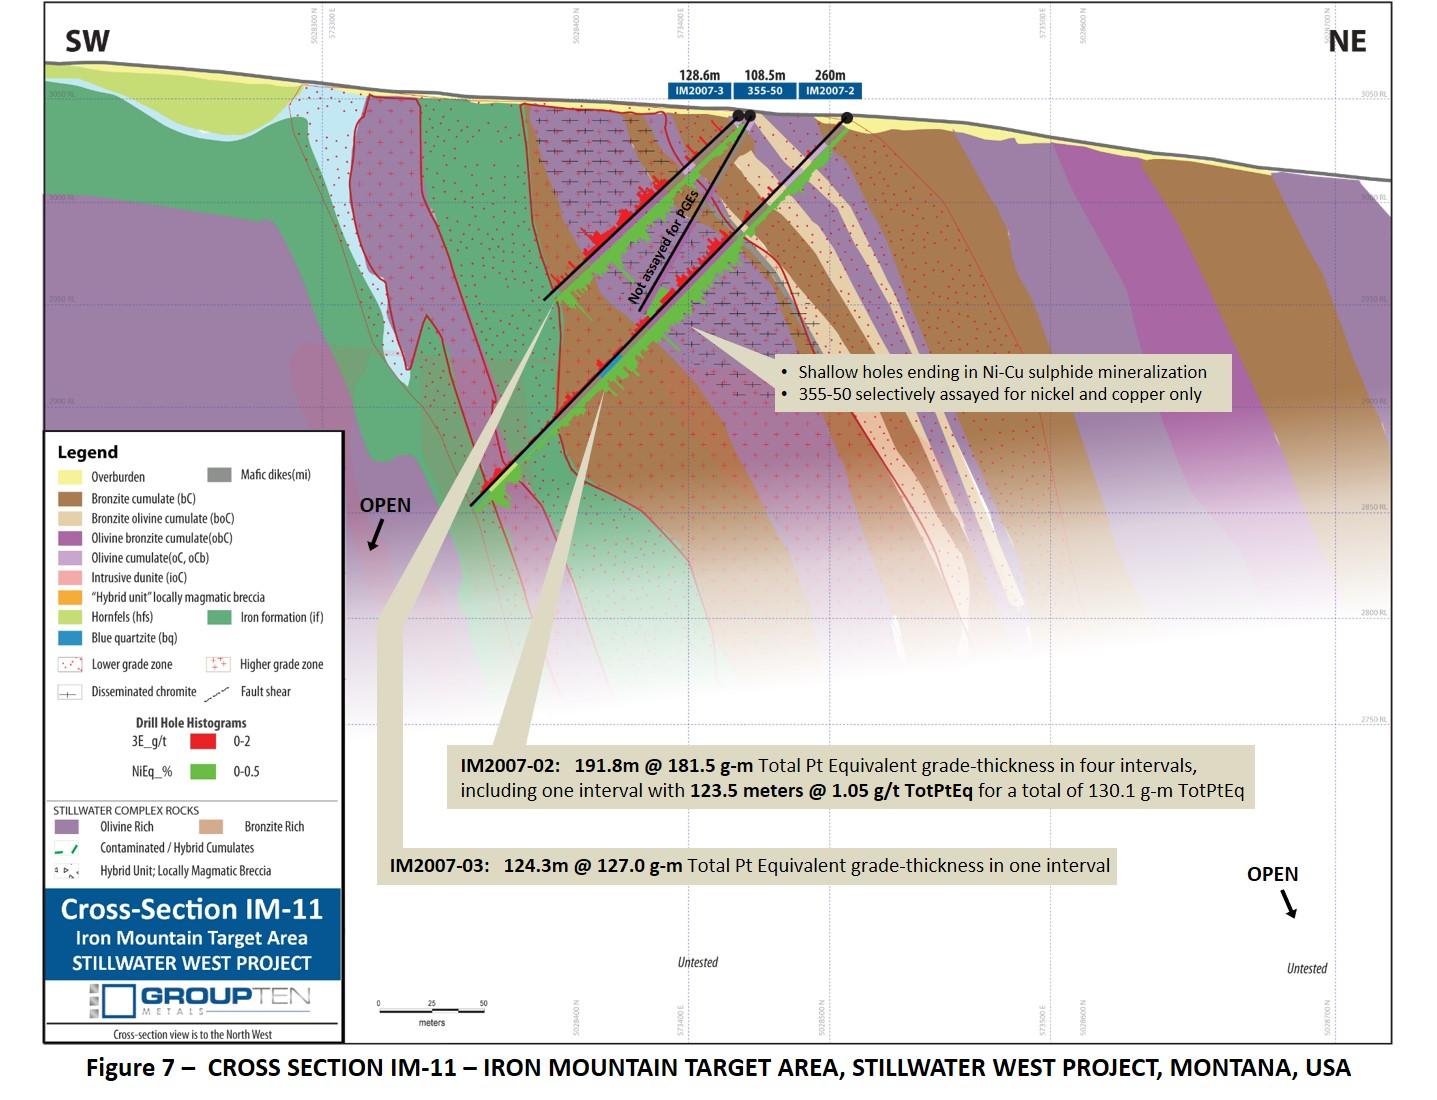 Figure 7 –  CROSS SECTION IM-11 – IRON MOUNTAIN TARGET AREA, STILLWATER WEST PROJECT, MONTANA, USA